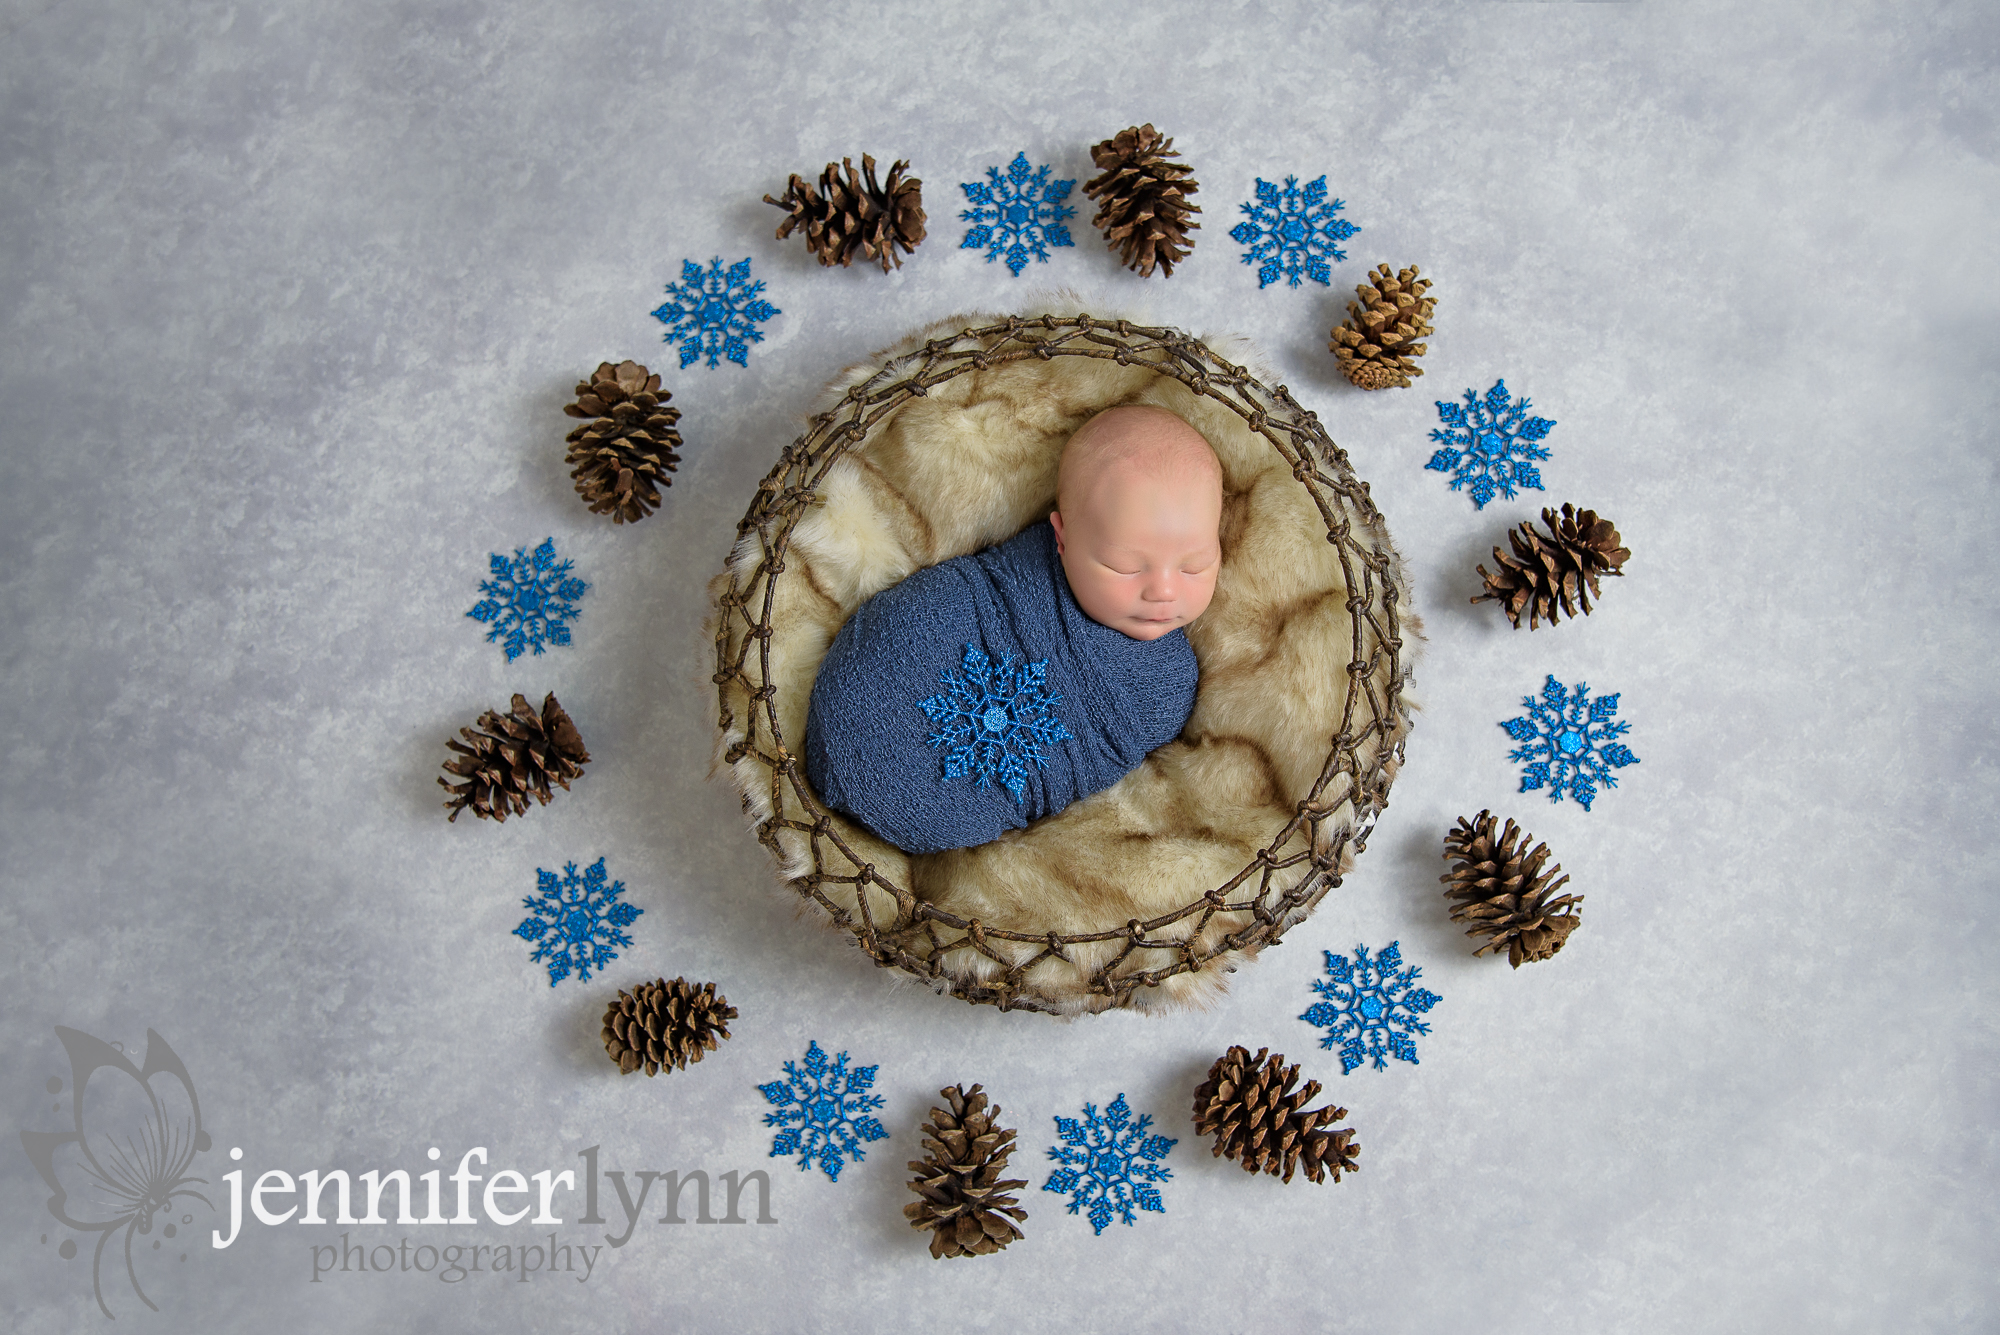 Newborn Boy Circle Basket Pinecones Snowflakes